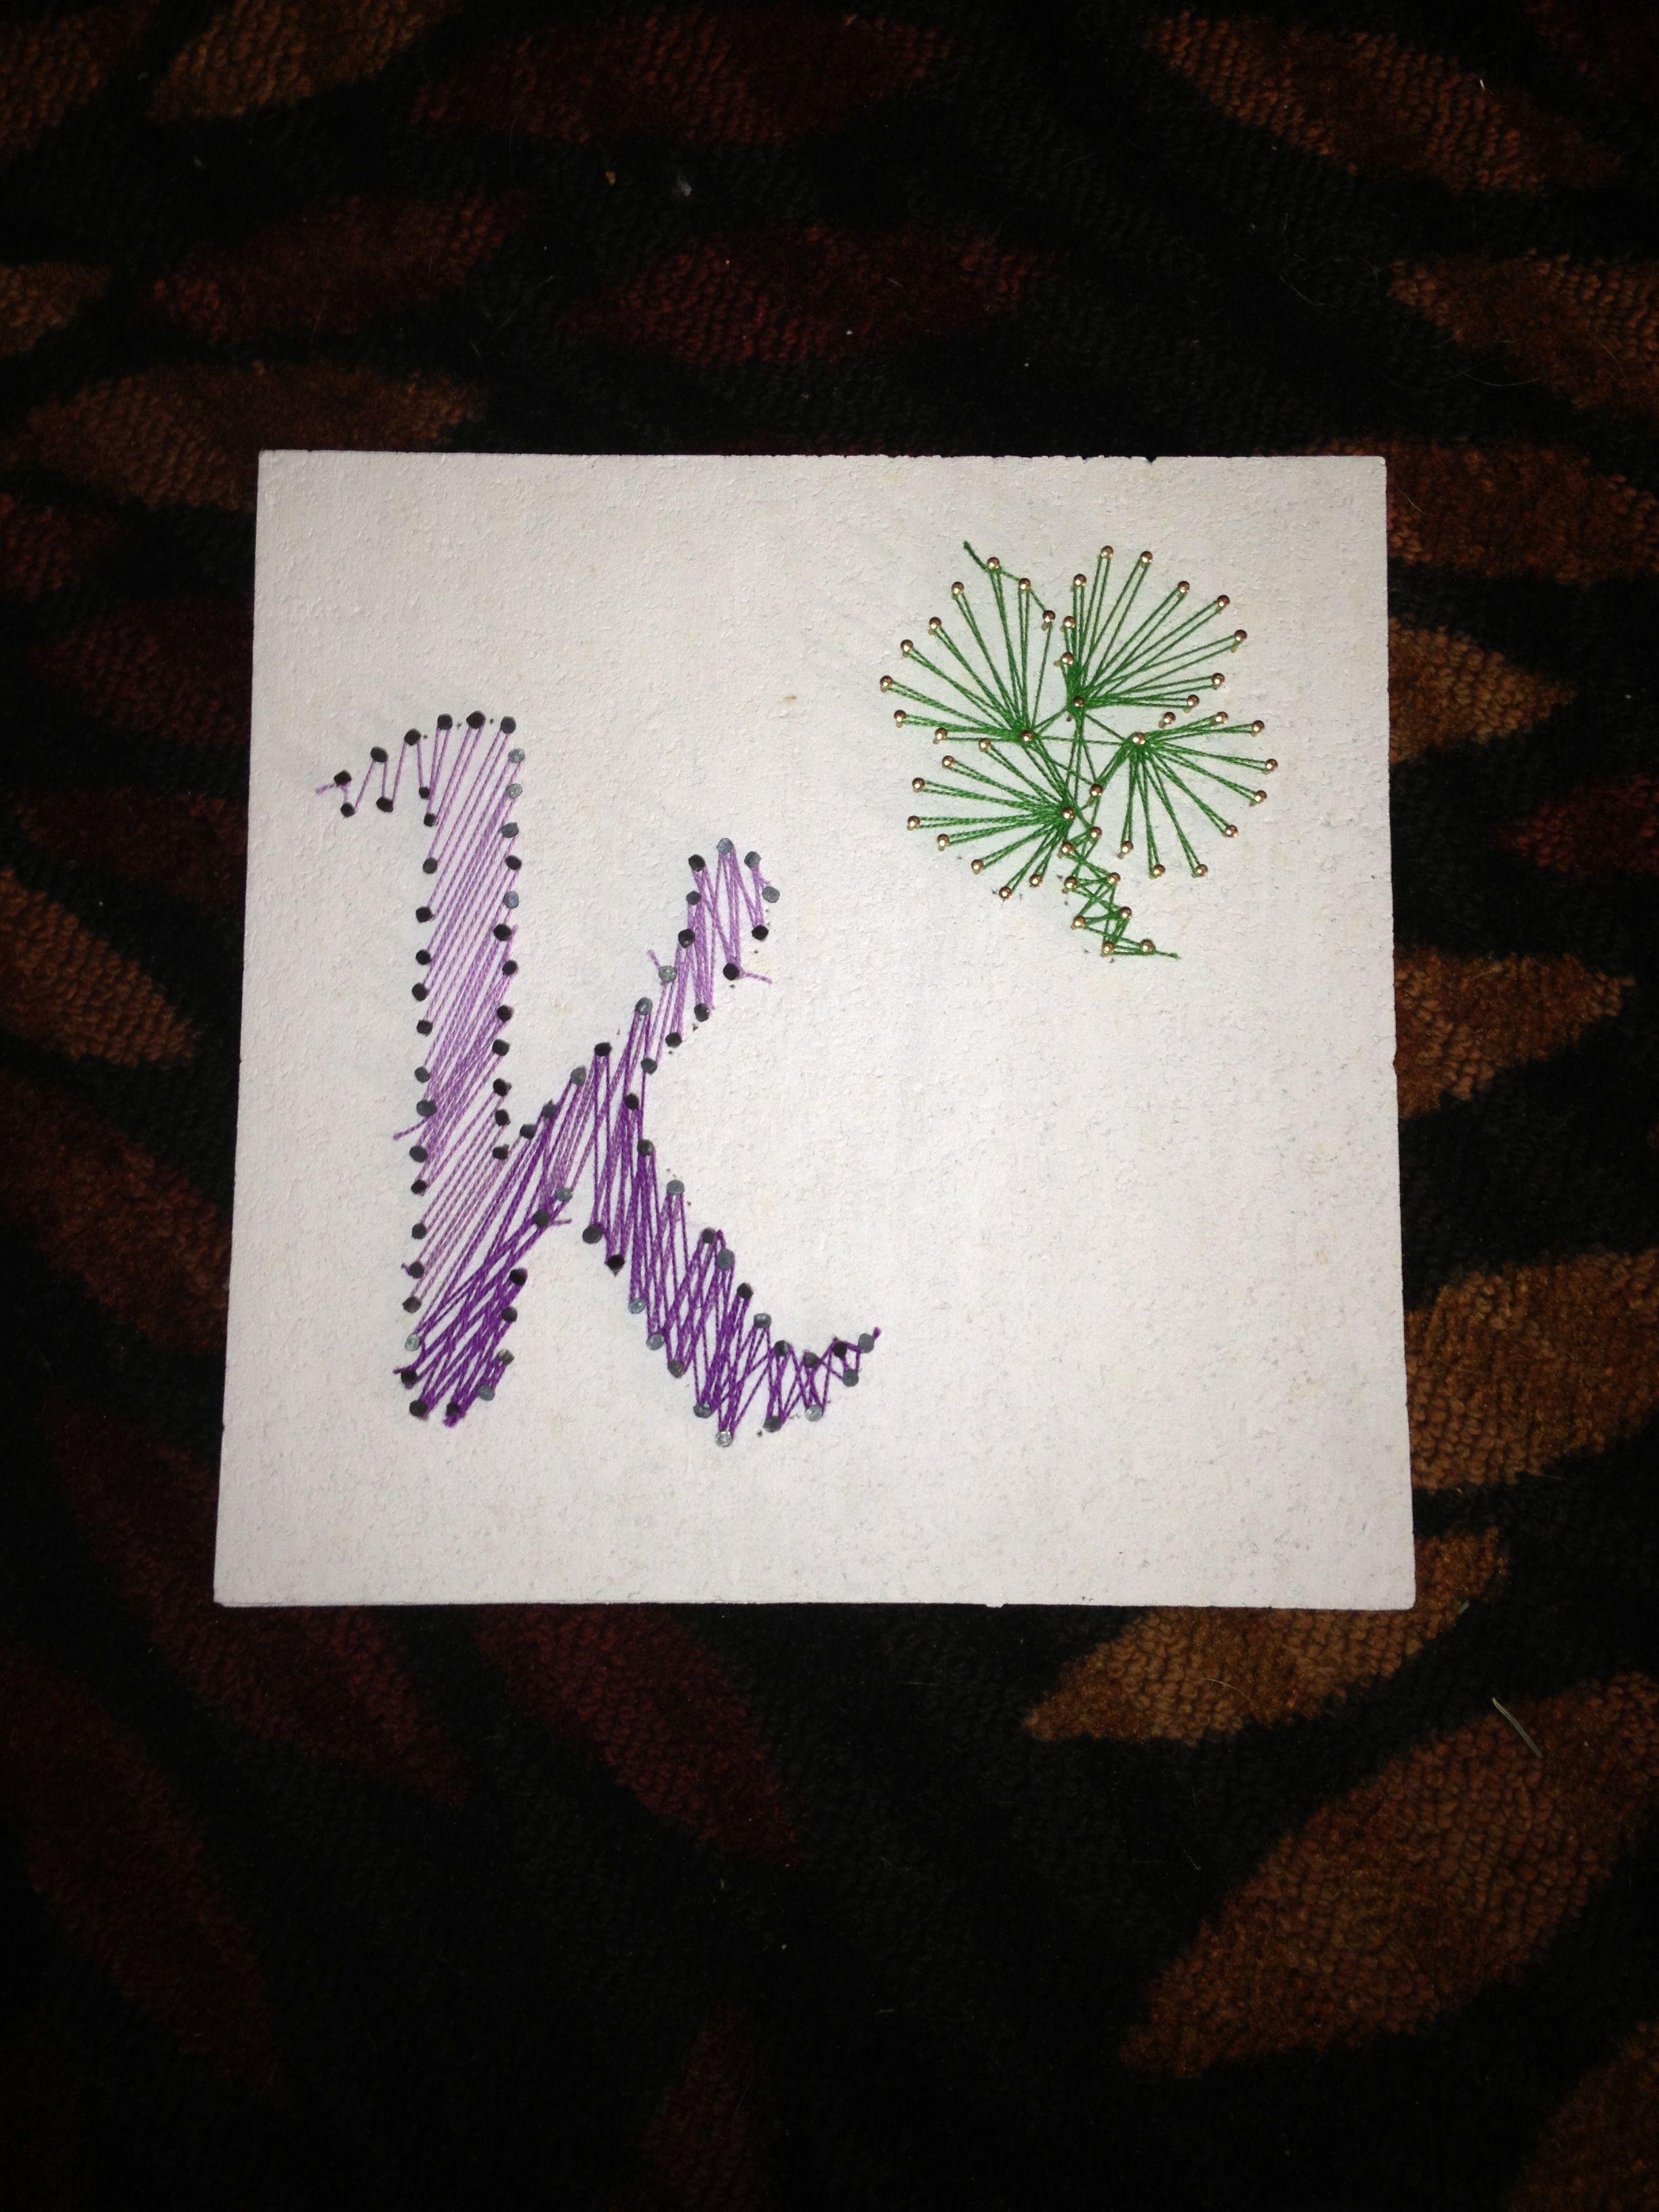 Avalisa letter upper case t stretched wall art - String Art Ombr Letter K In Celtic Font With Four Leaf Clover